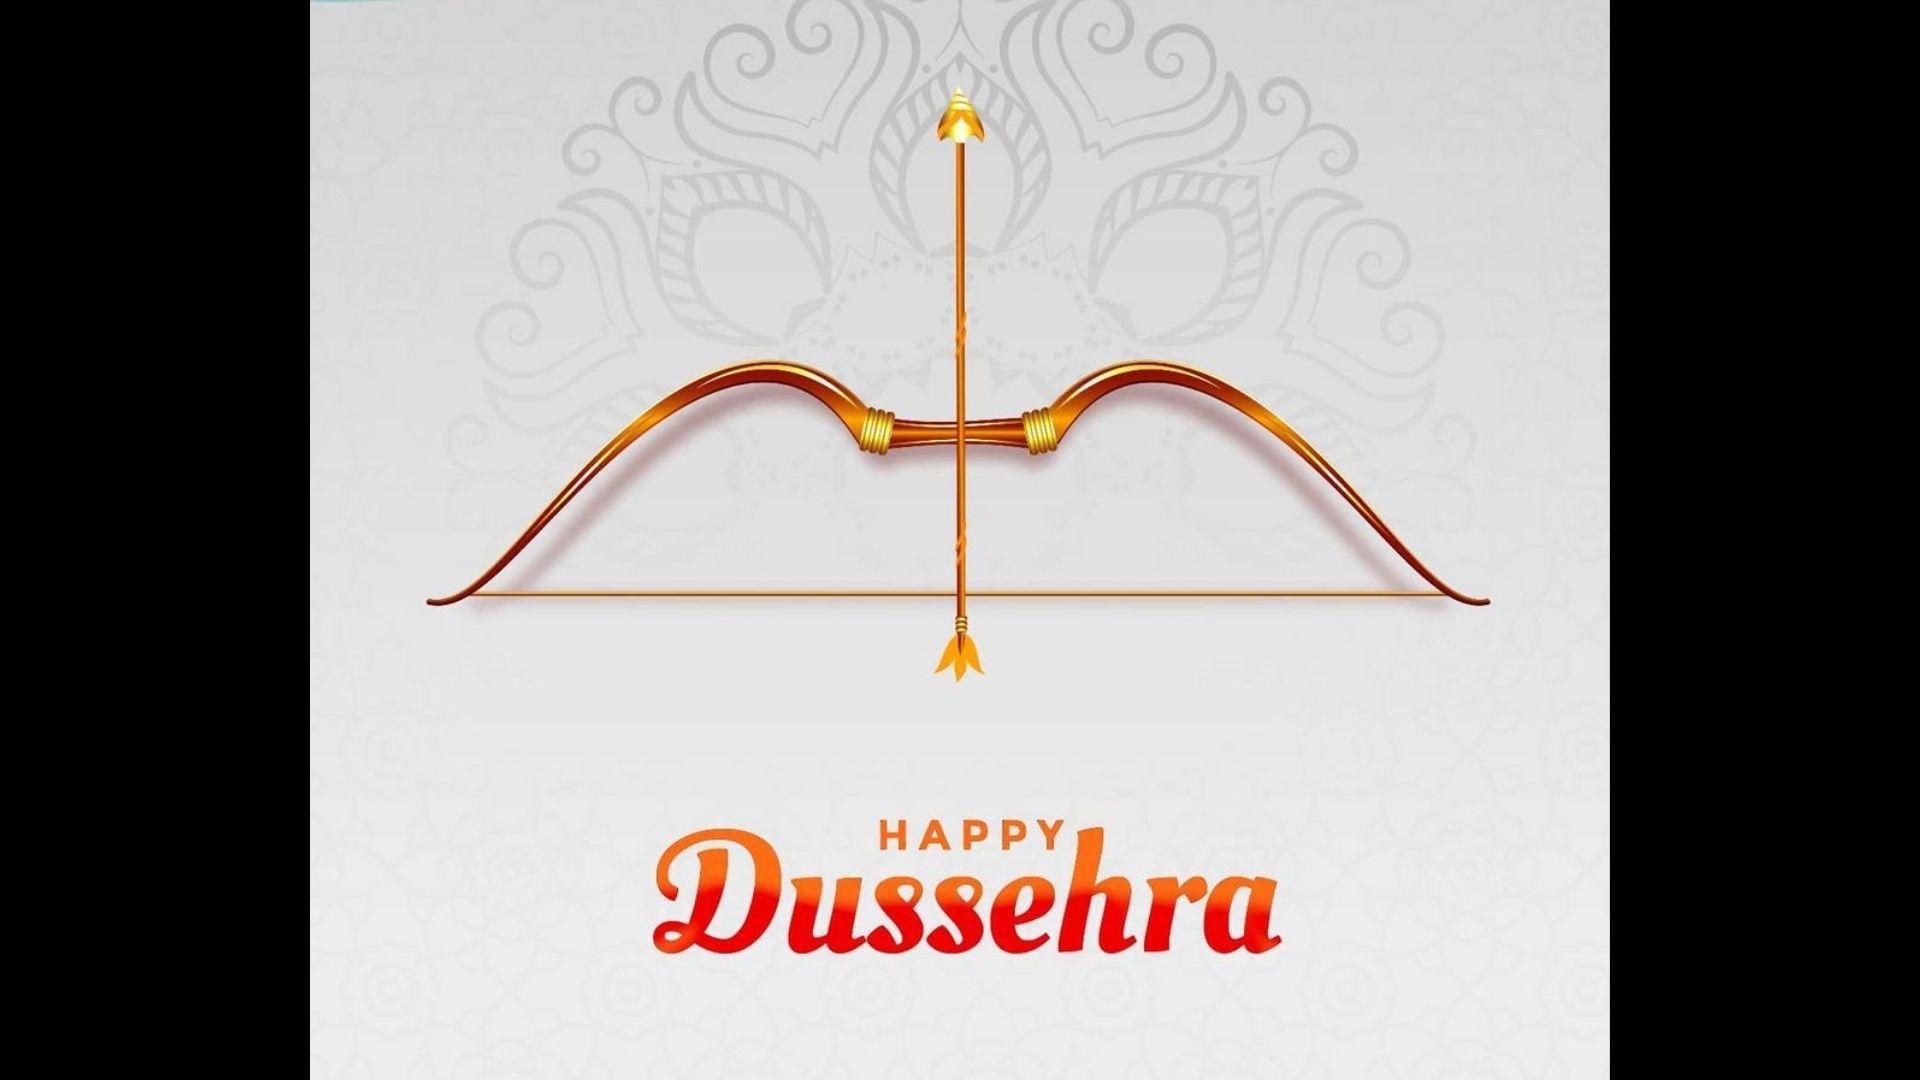 Dussehra 2021: Amitabh Bachchan, Kareena Kapoor Khan, Shilpa Shetty And Kangana Ranaut Among Others Extend Their Warm Wishes On Vijaya Dashmi